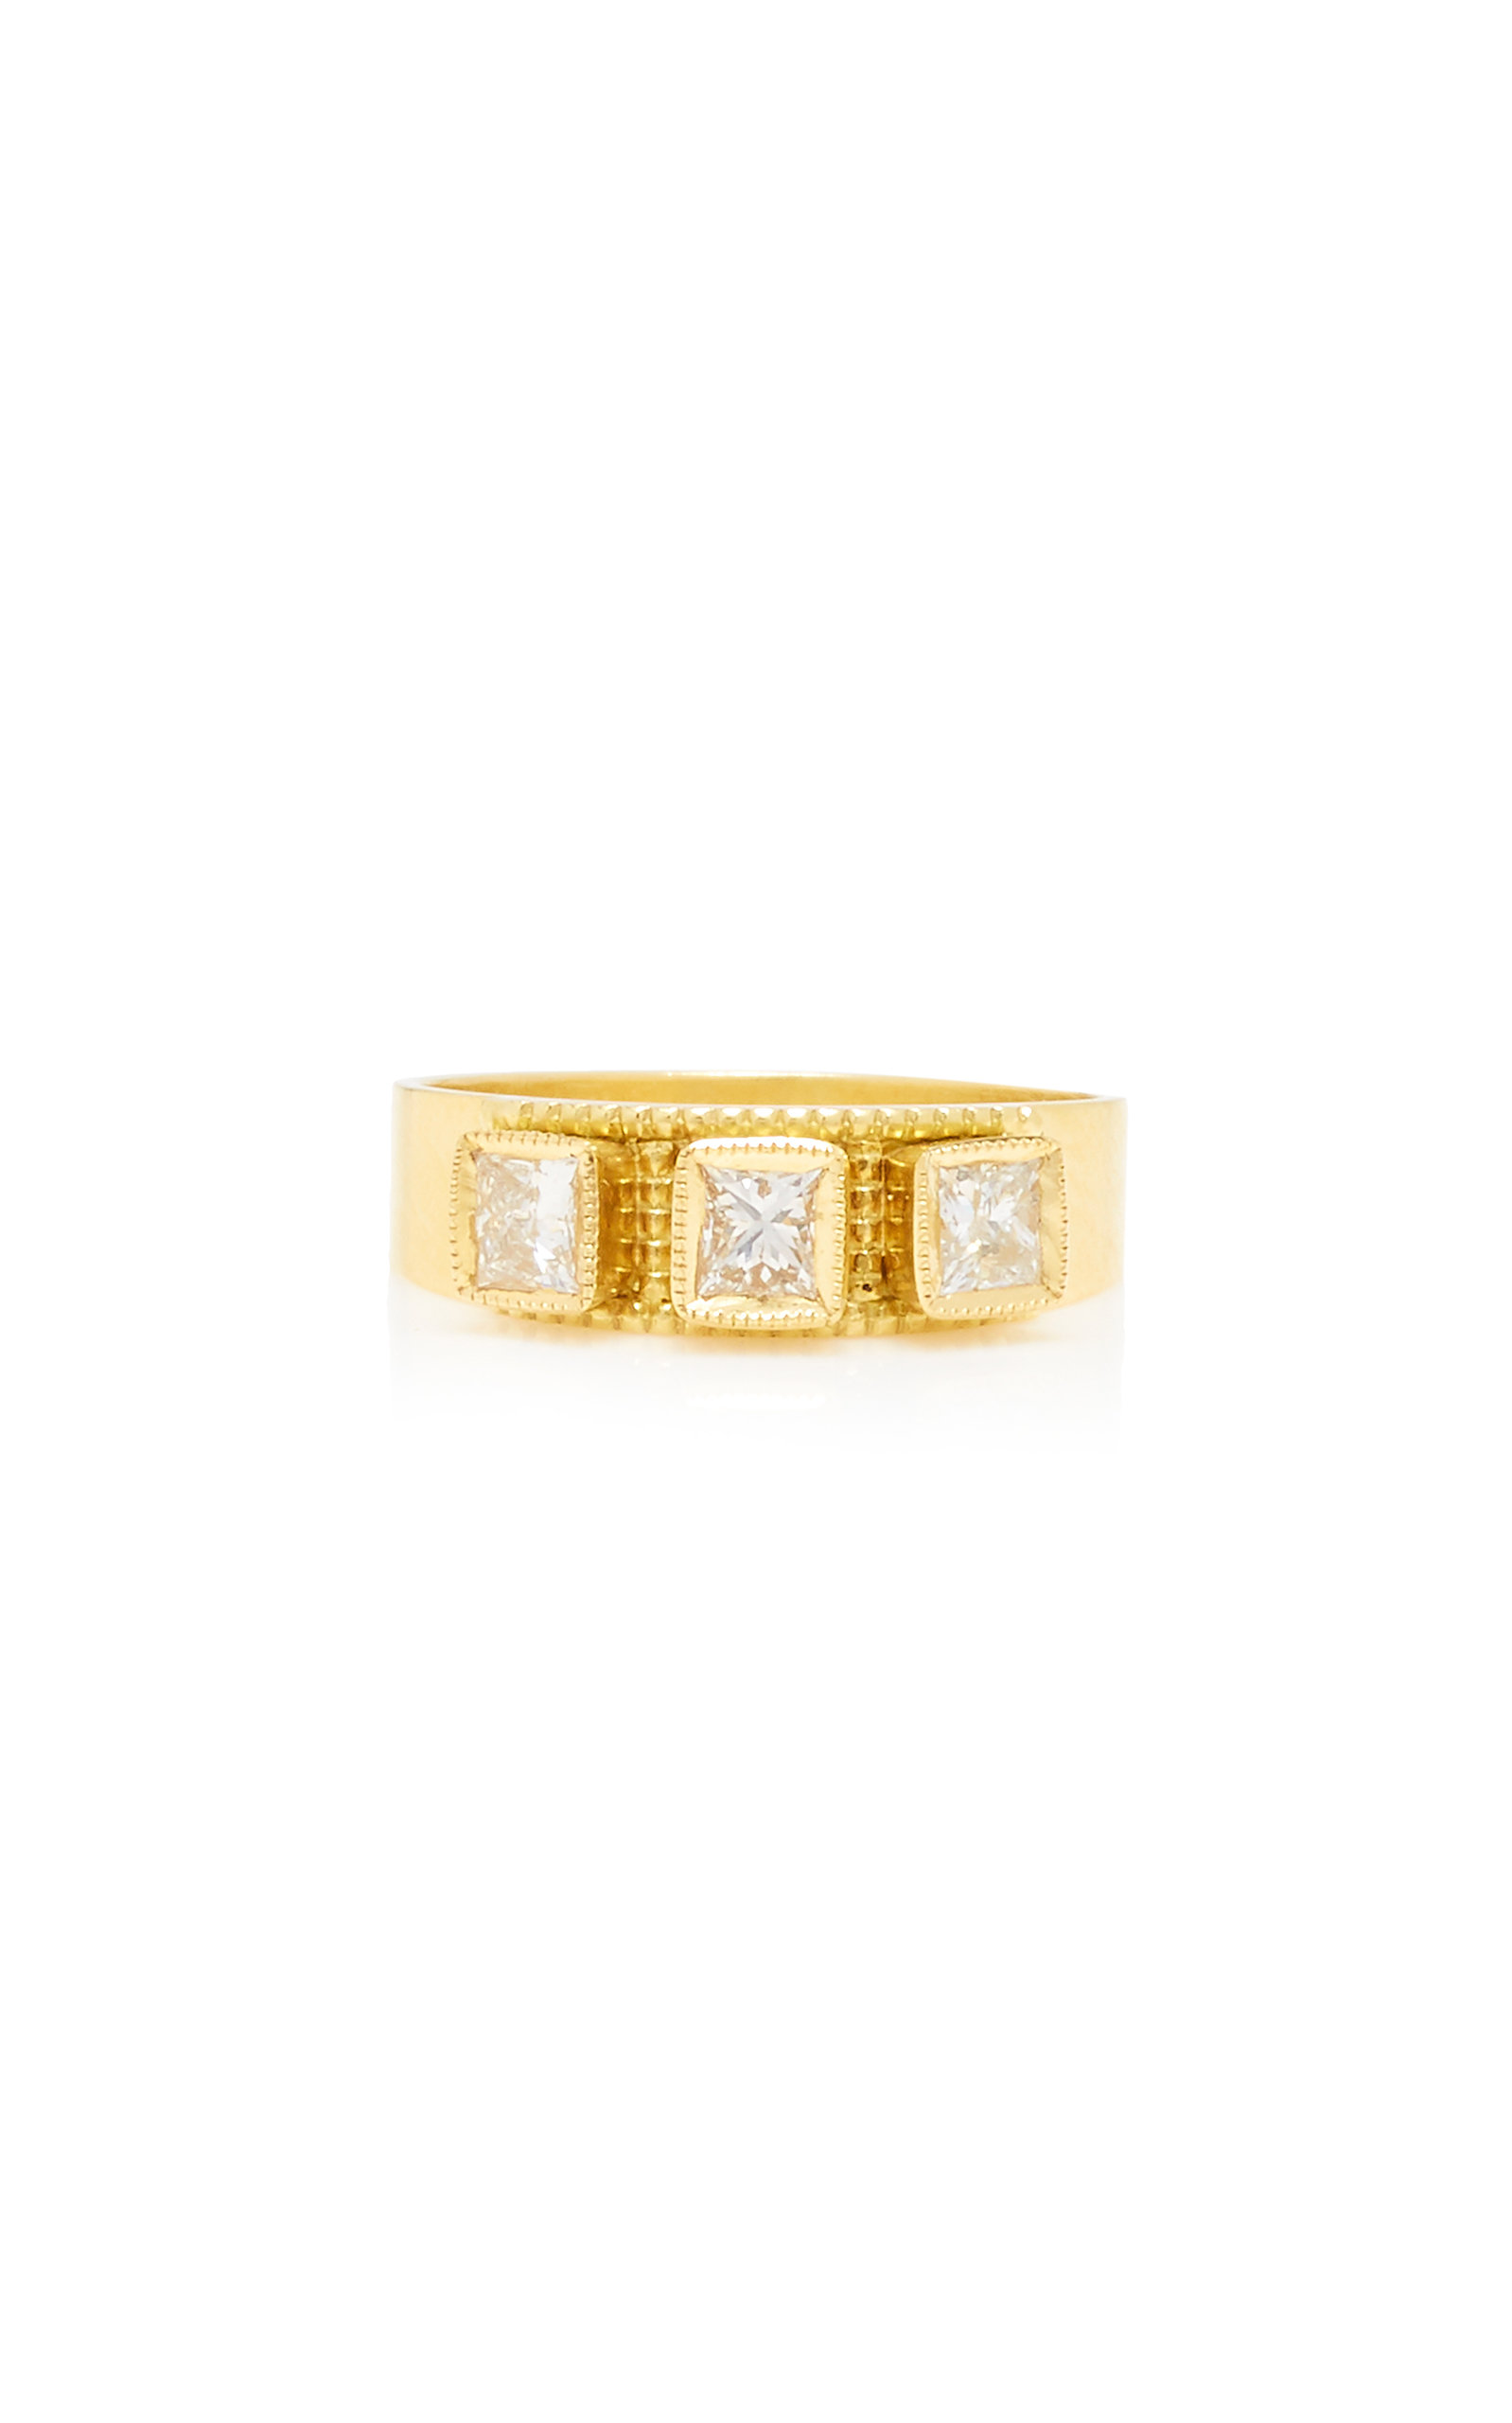 Women's 18K Gold and Diamond Ring